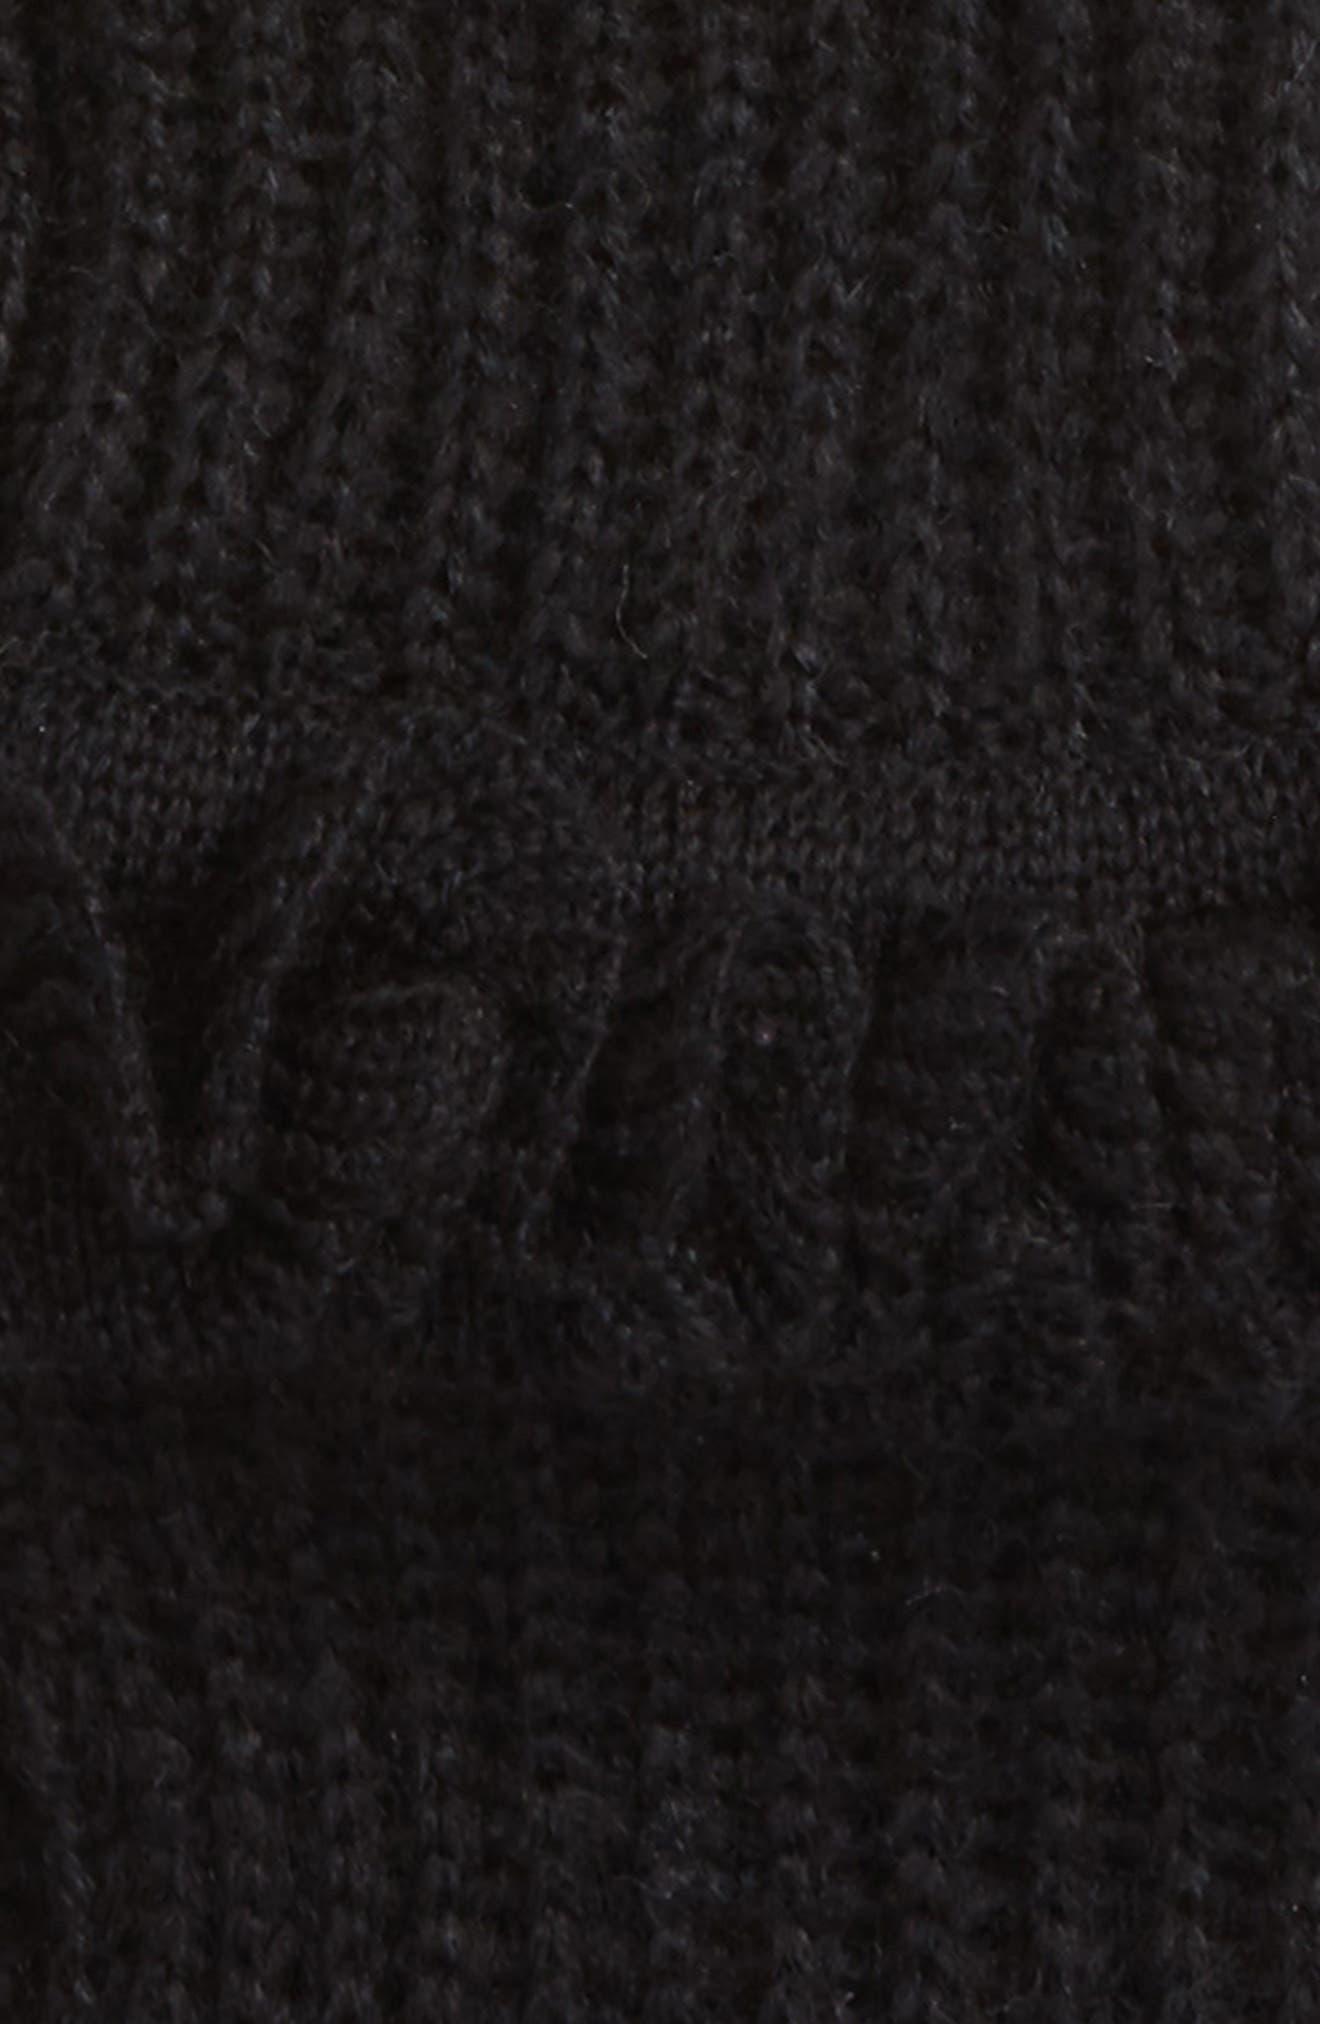 Alternate Image 2  - Rebecca Minkoff Ruffle Fingerless Gloves